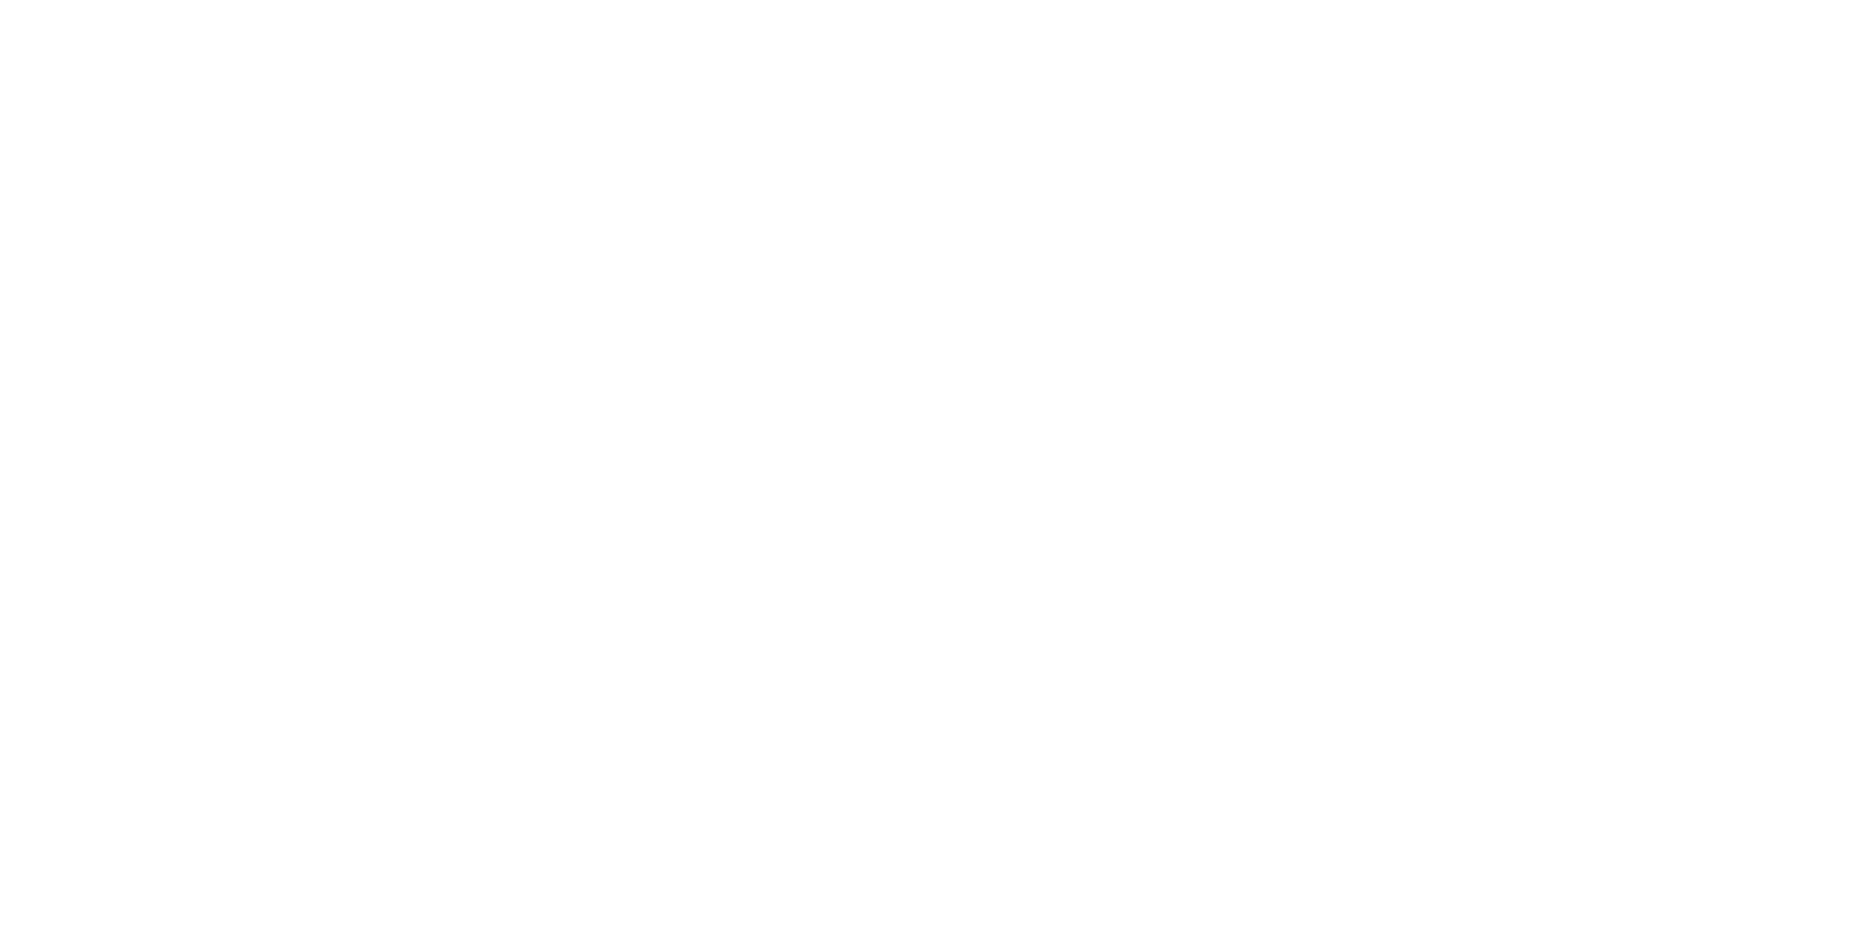 reetags_logo